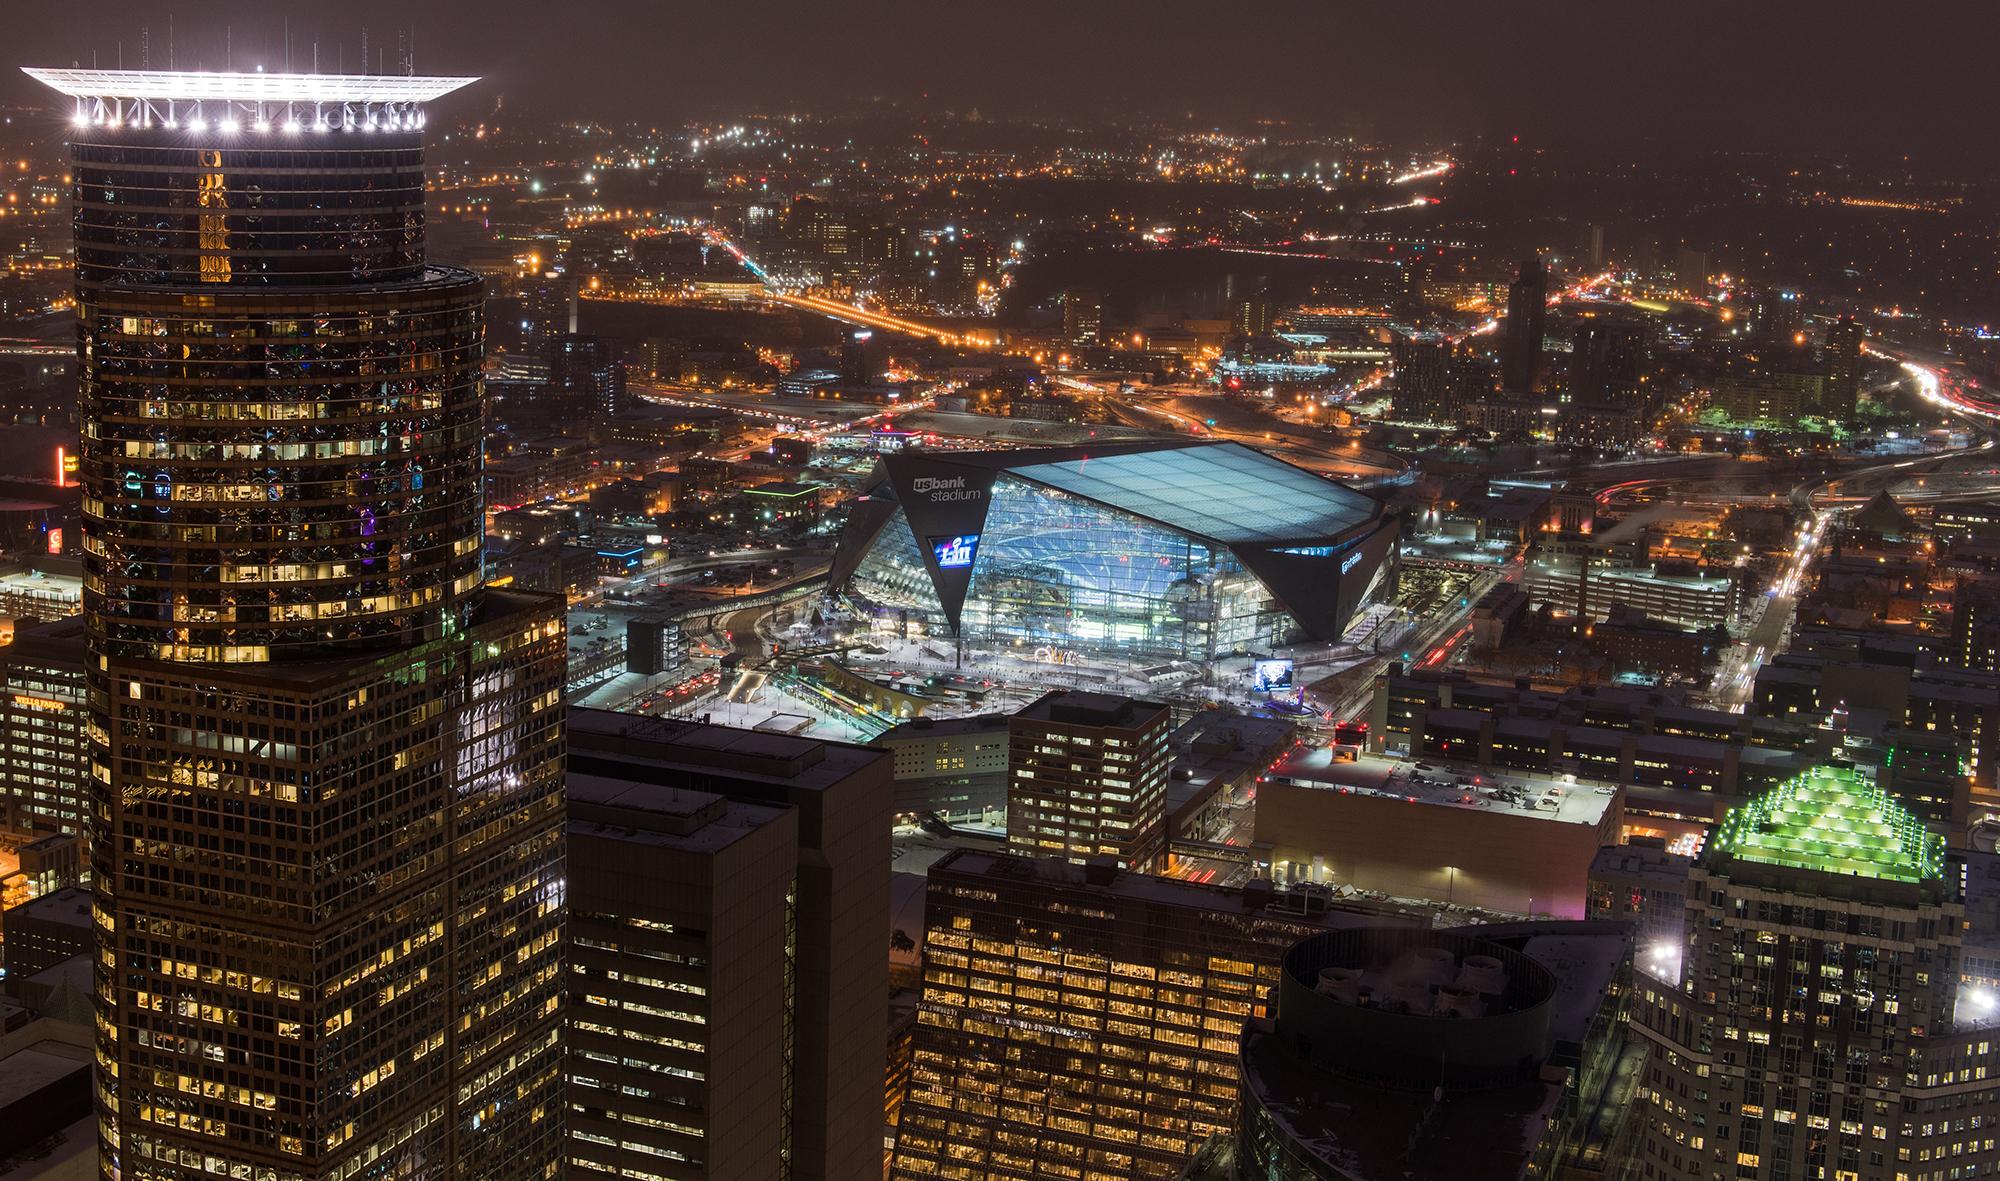 Night View of U.S. Bank Stadium in Minneapolis